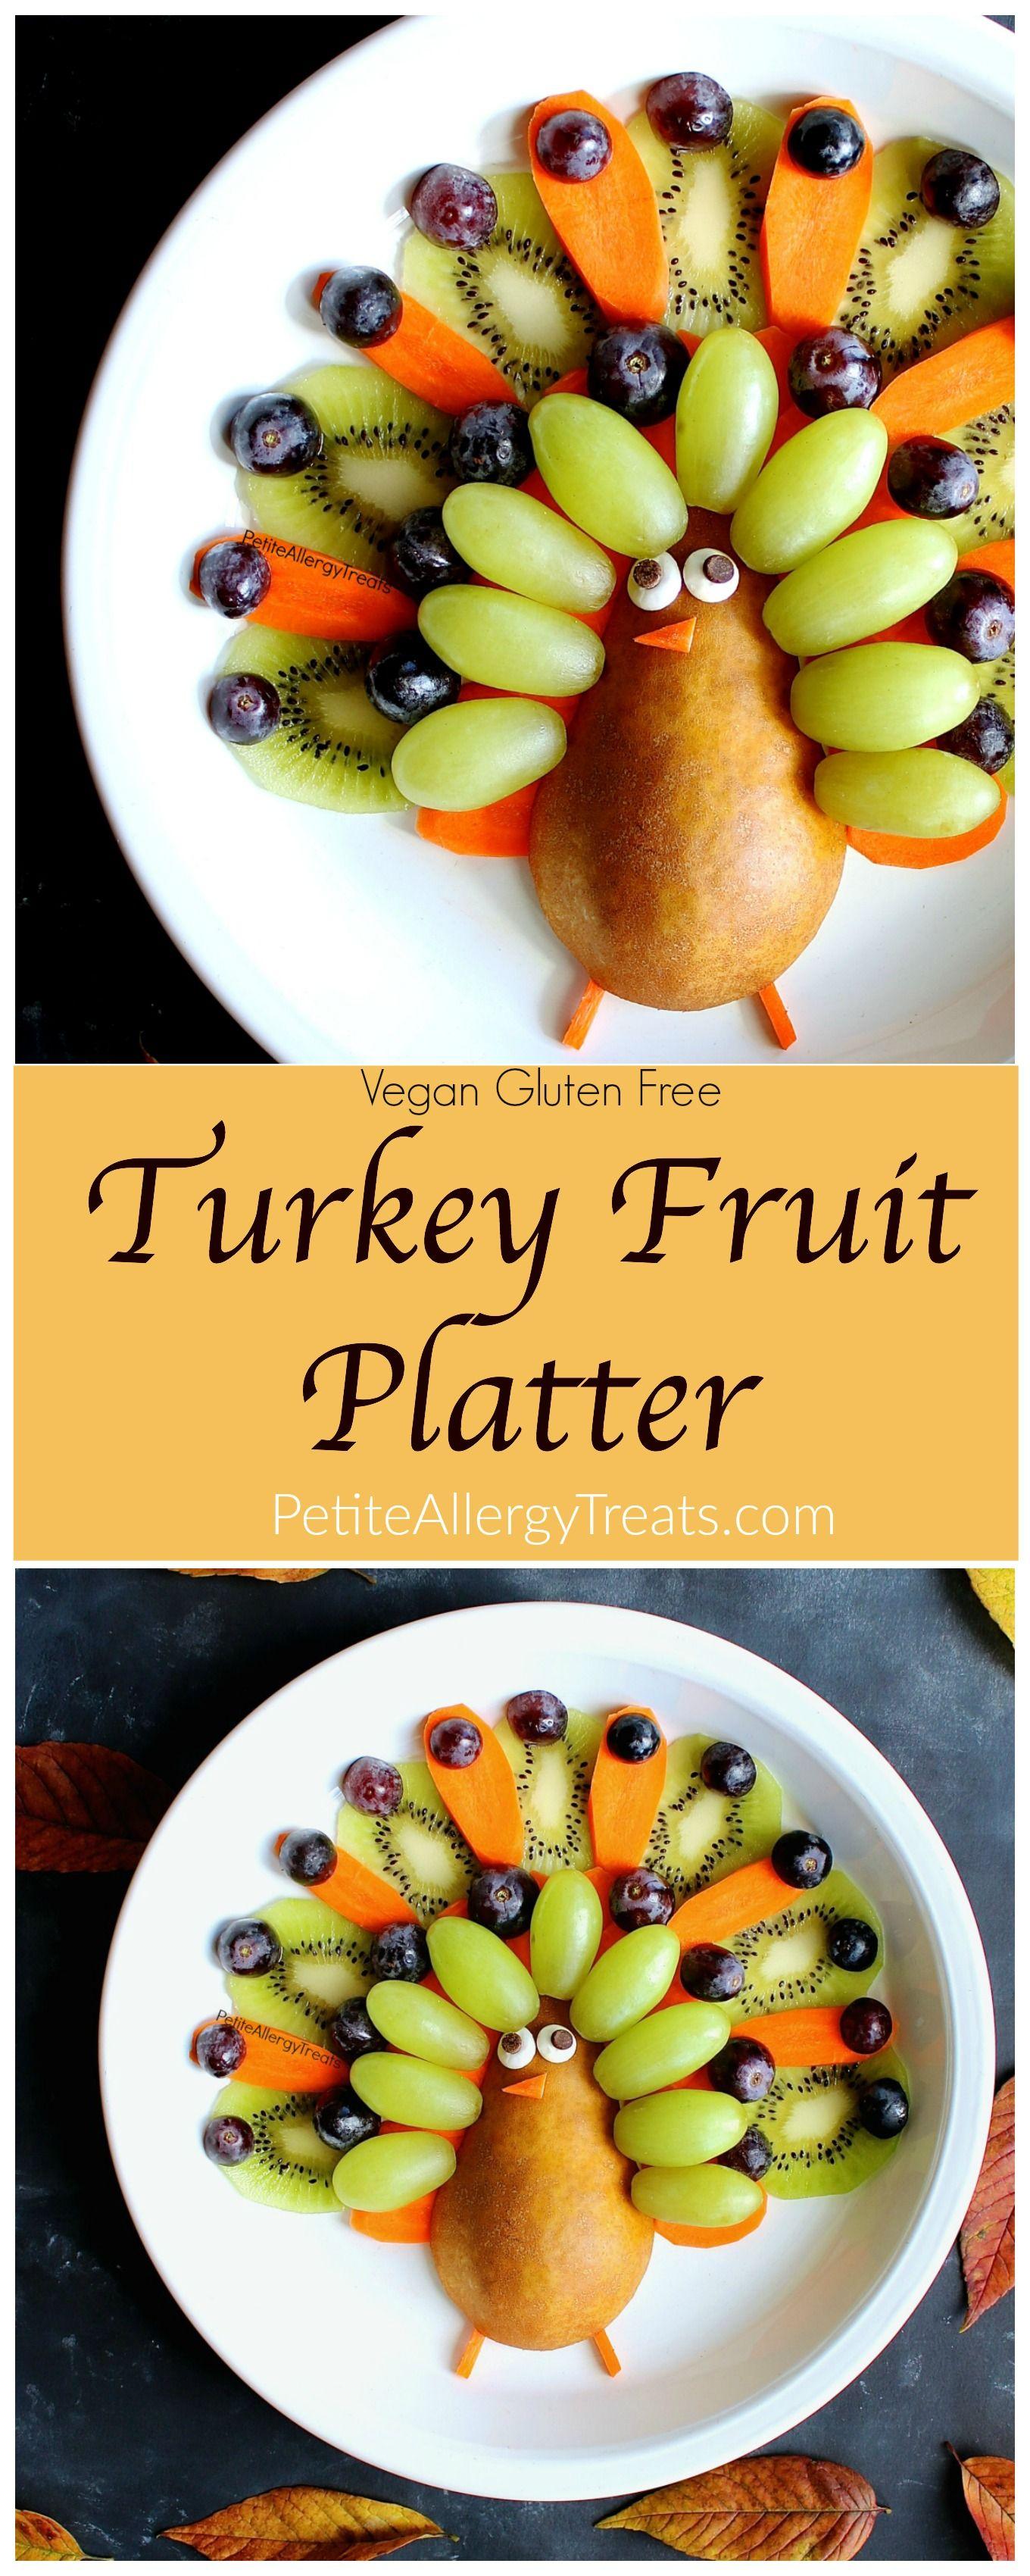 Vegan Turkey Fruit Platter (gluten free ) Recipe- Adorable easy party turkey fruit platter! Simple center piece for Thanksgiving!